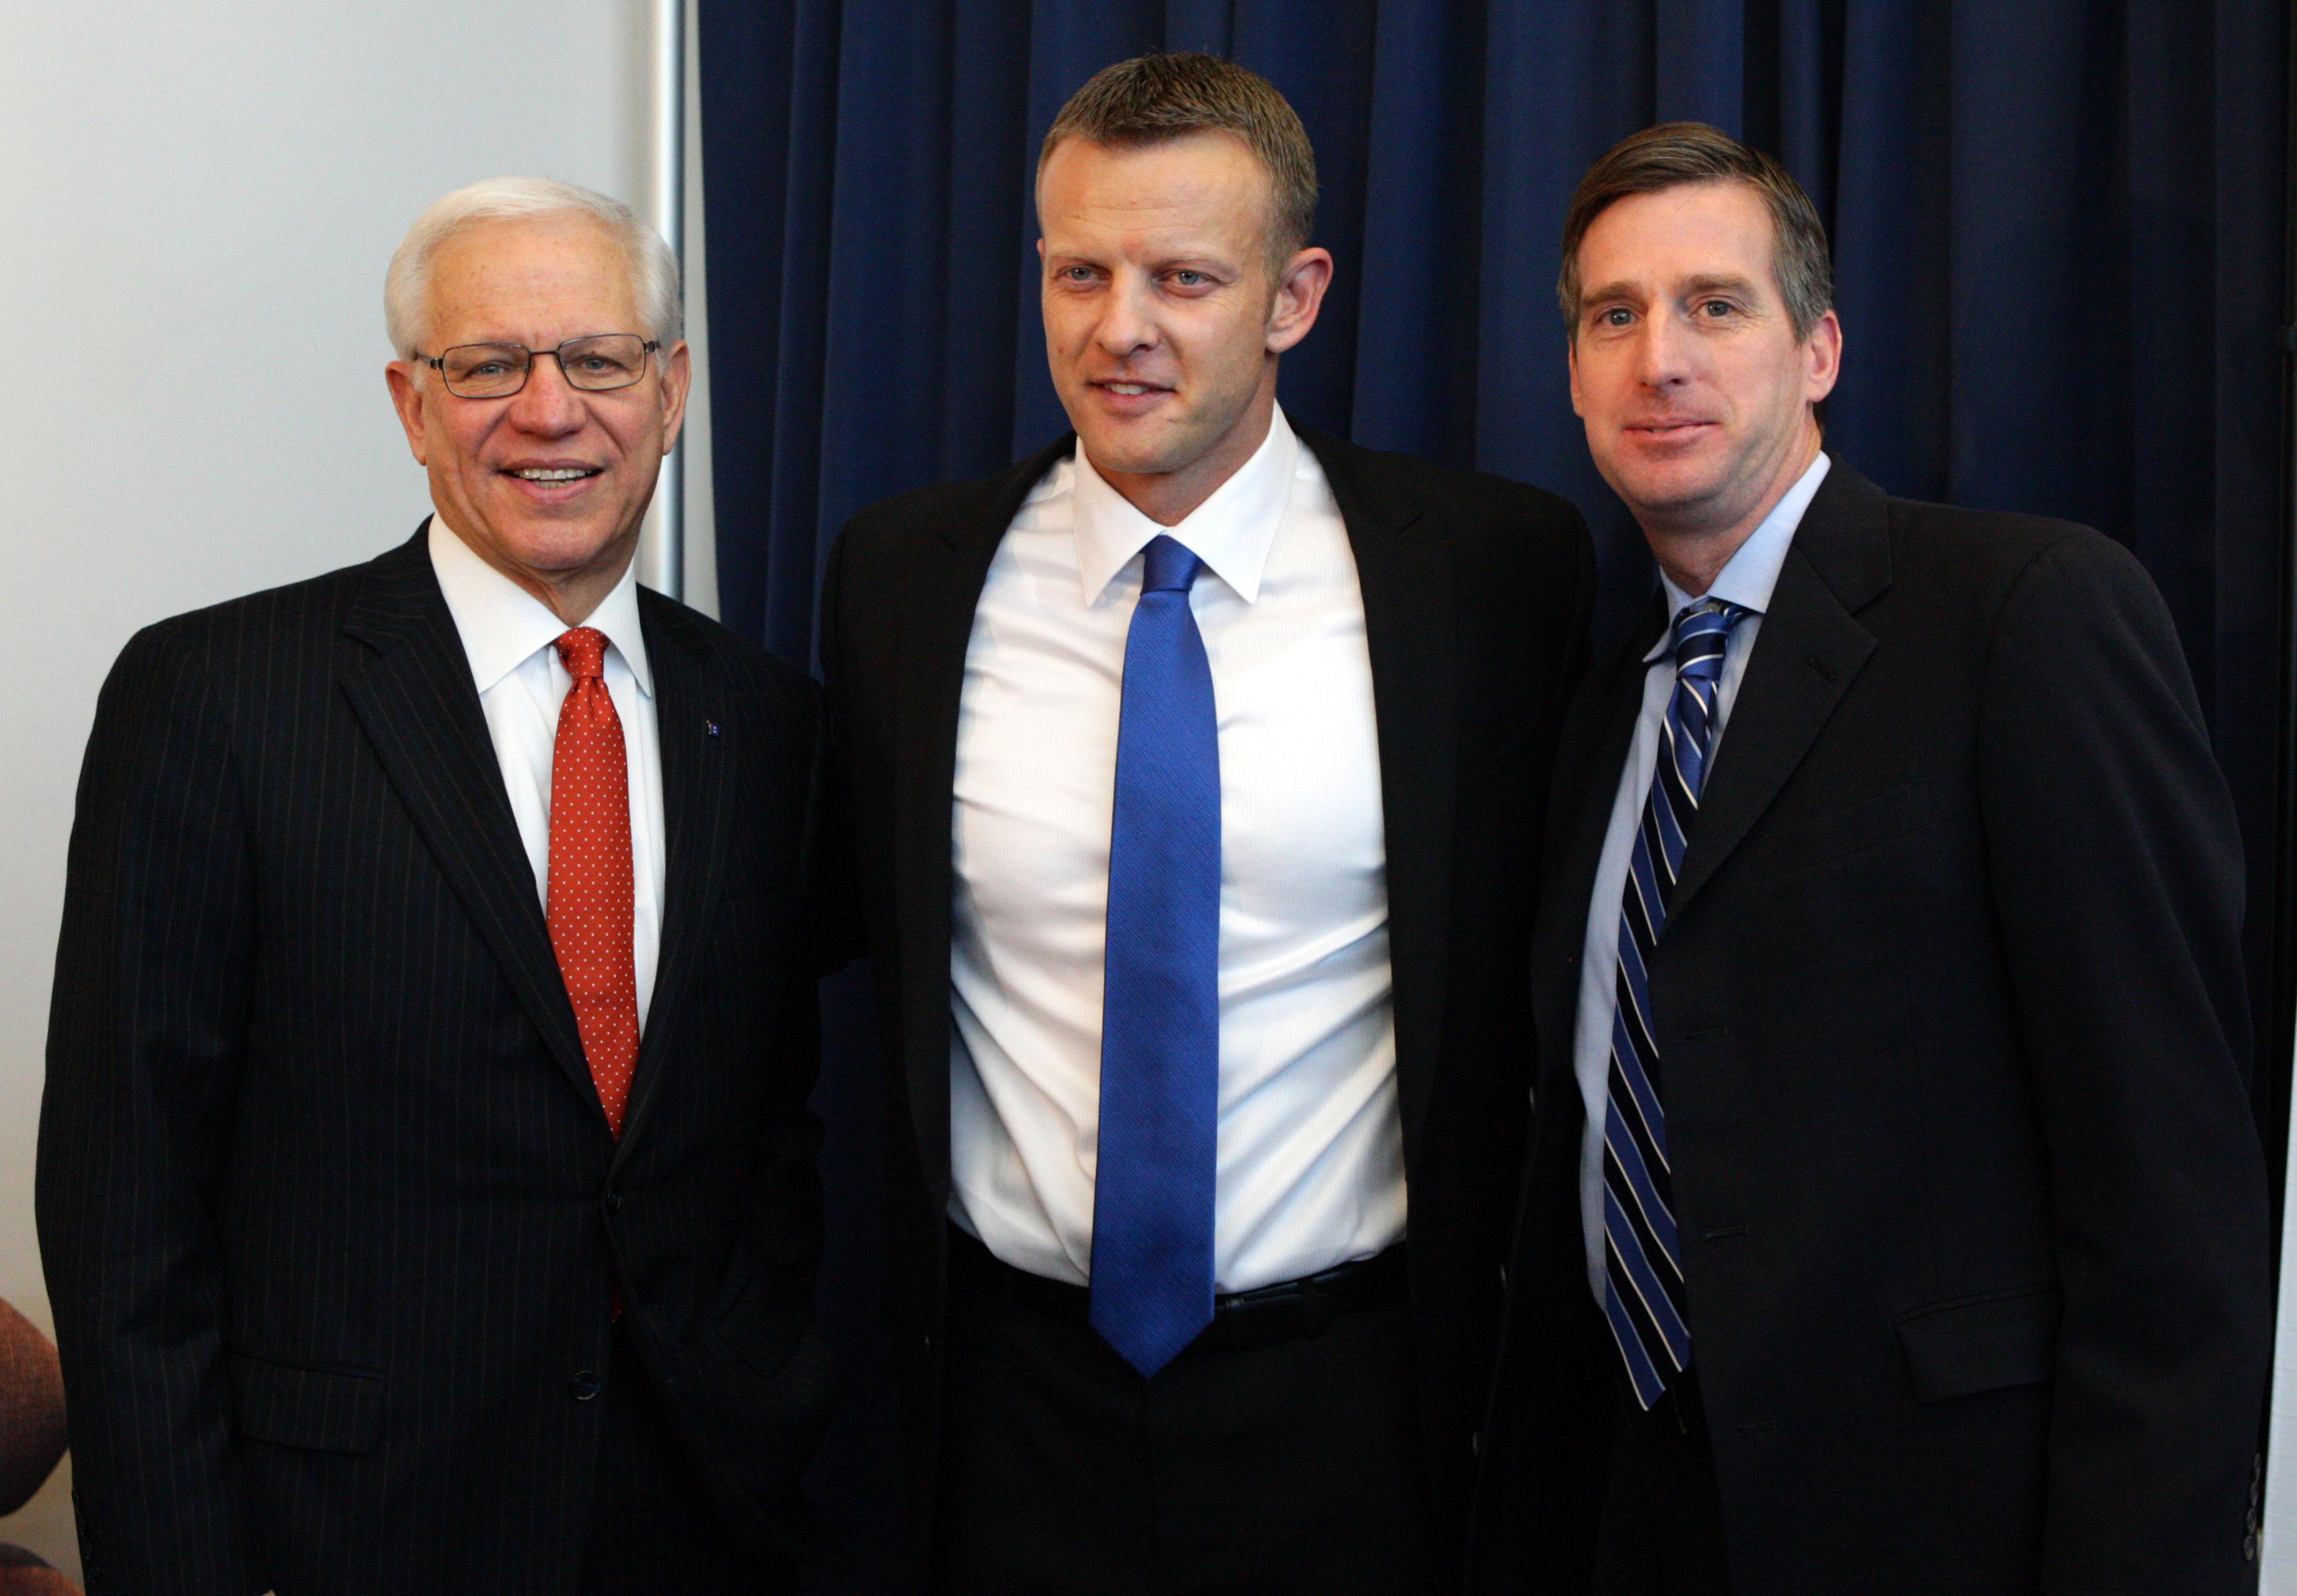 Dec 13, 2013; Boise, ID, USA; Boise State pesident Dr Bob Kustra (left,) head football coach Bryan Harsin, (center) and athletic director Mark Coyle.